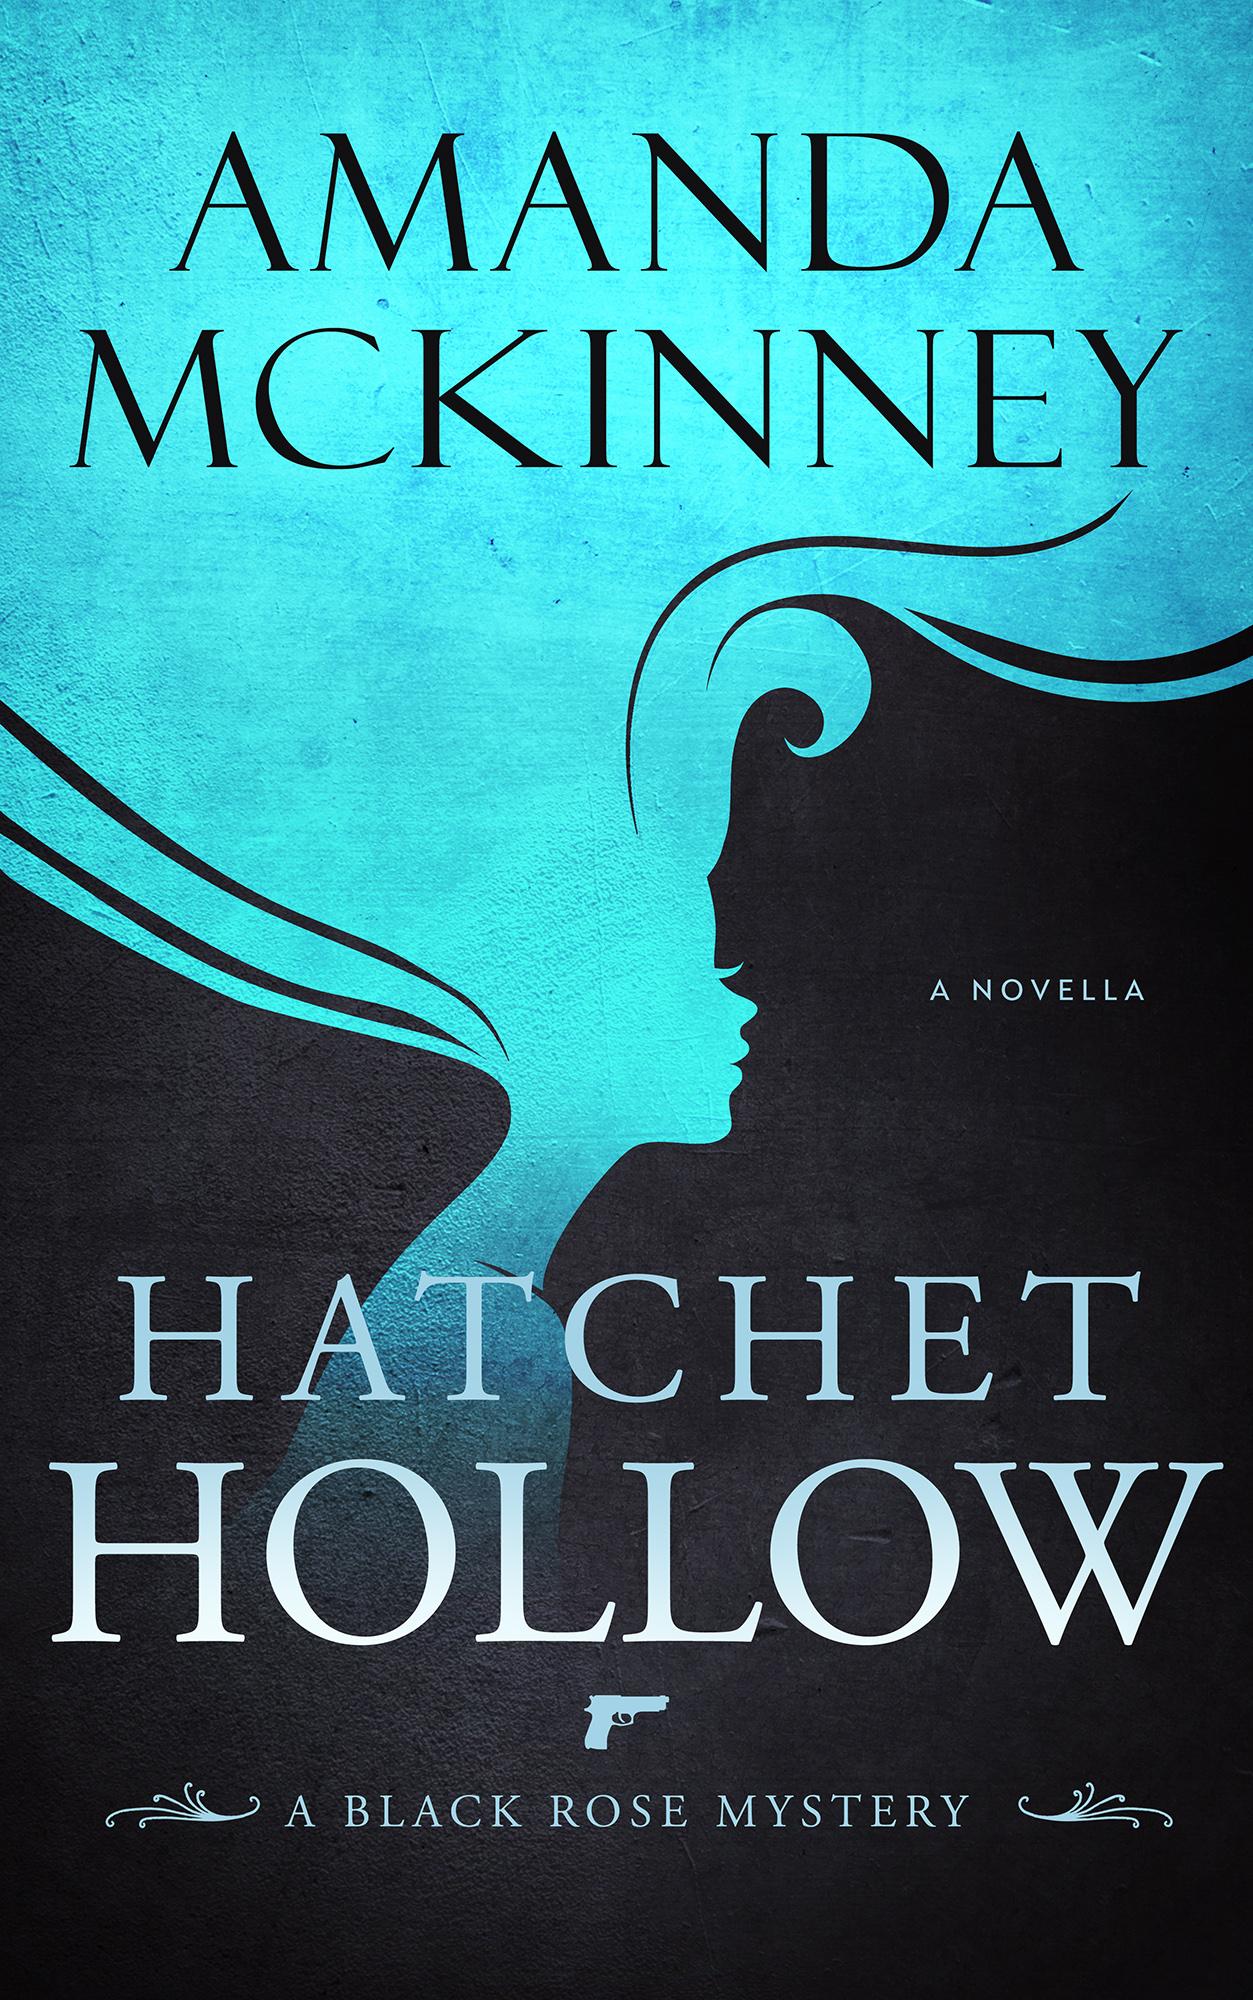 Hatchet Hollow - eBook small.jpg